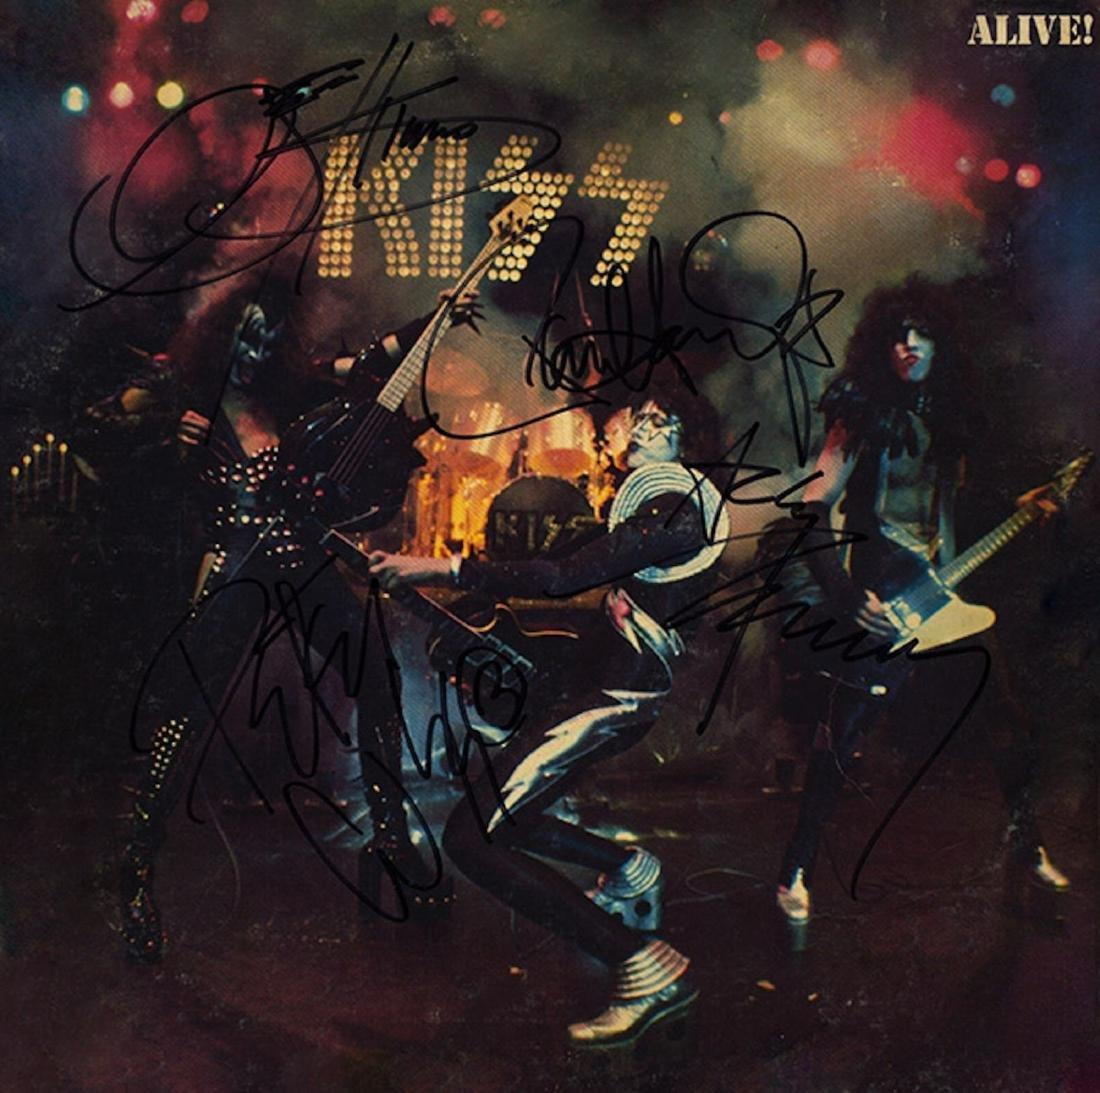 Signed Kiss Alve Album